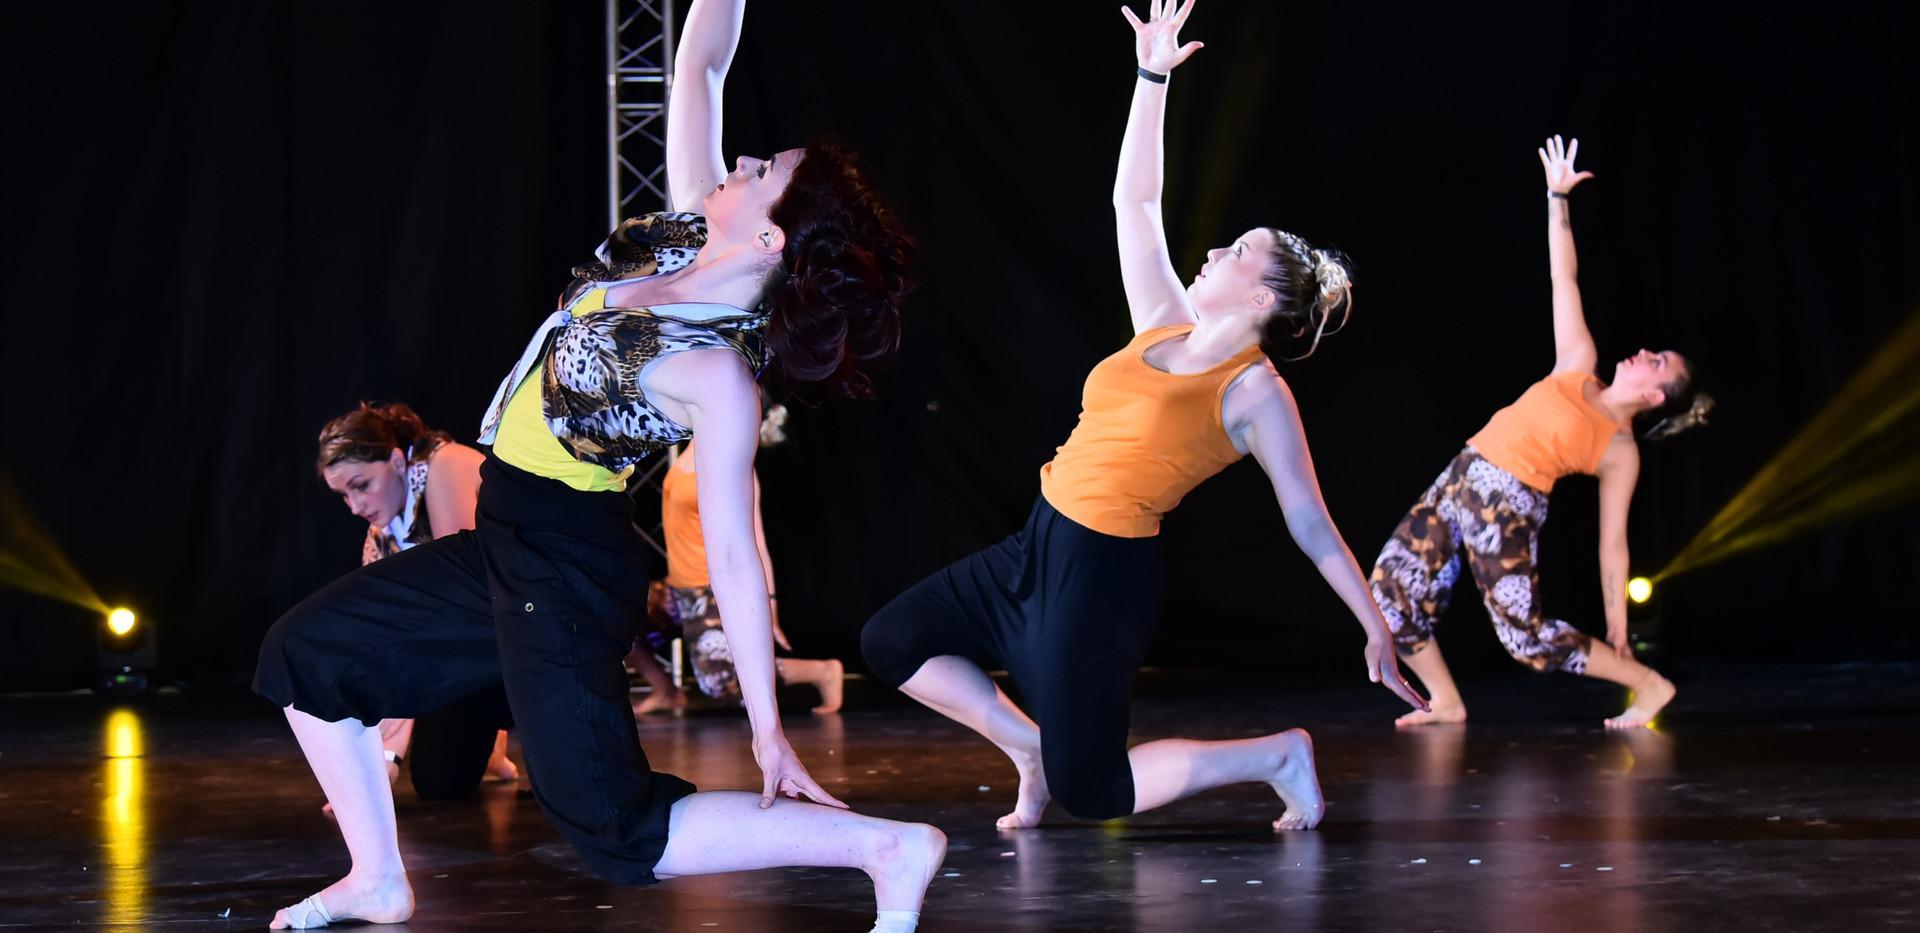 DANCE SHOW 19 - LES ANGELS (50)_GF.jpg